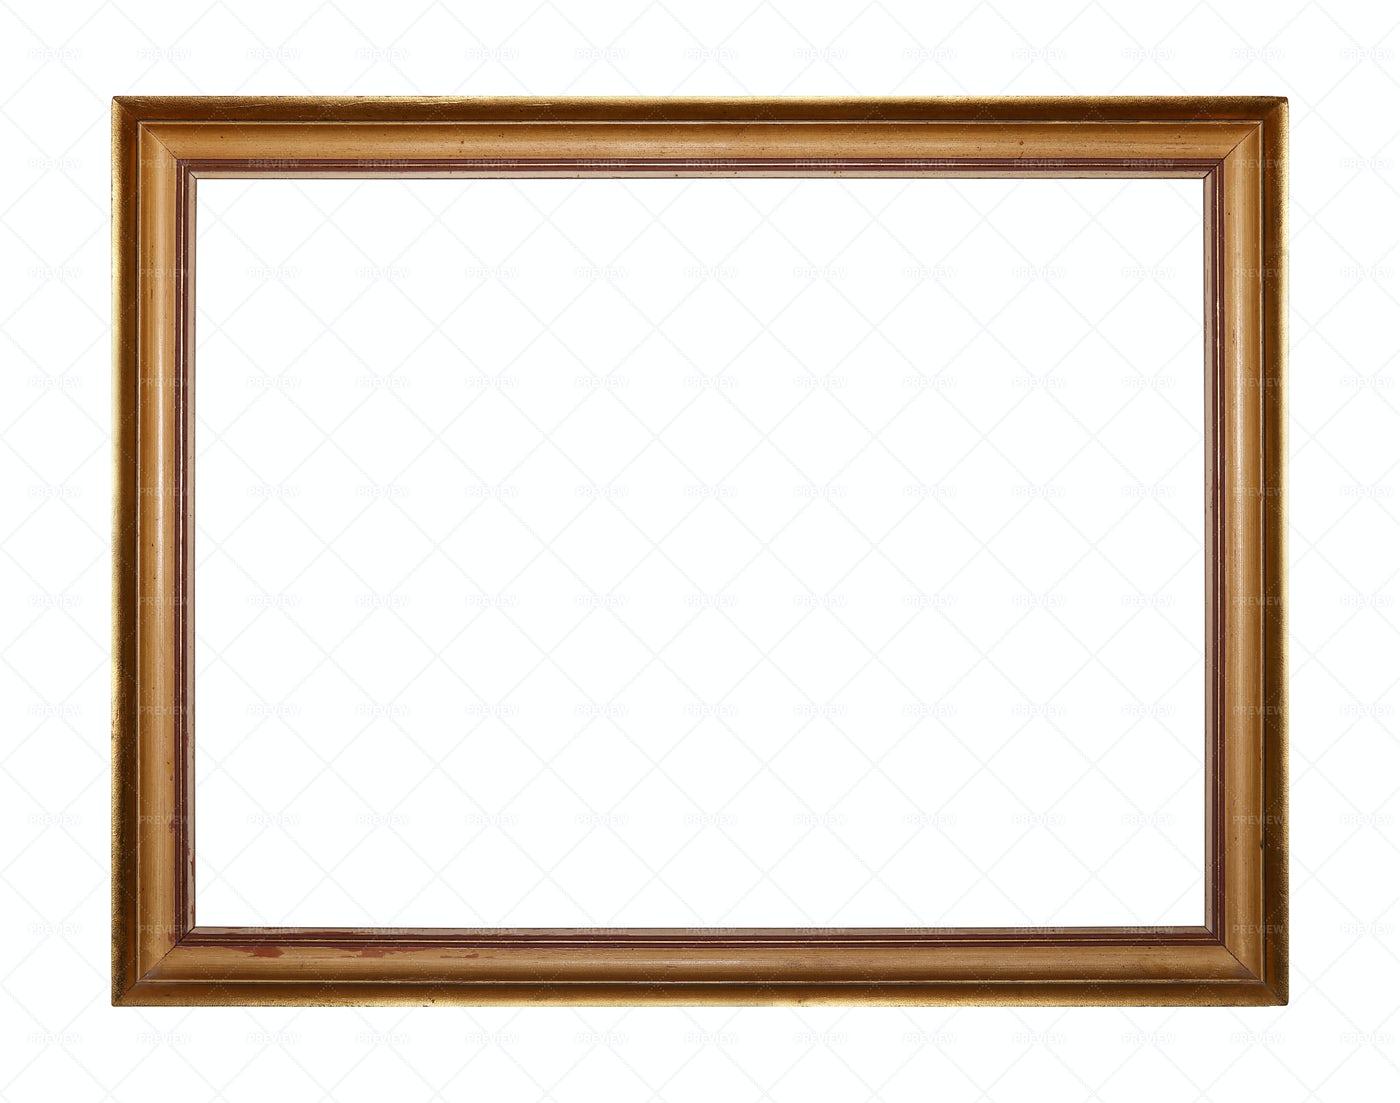 Golden Square Photo Frame: Stock Photos